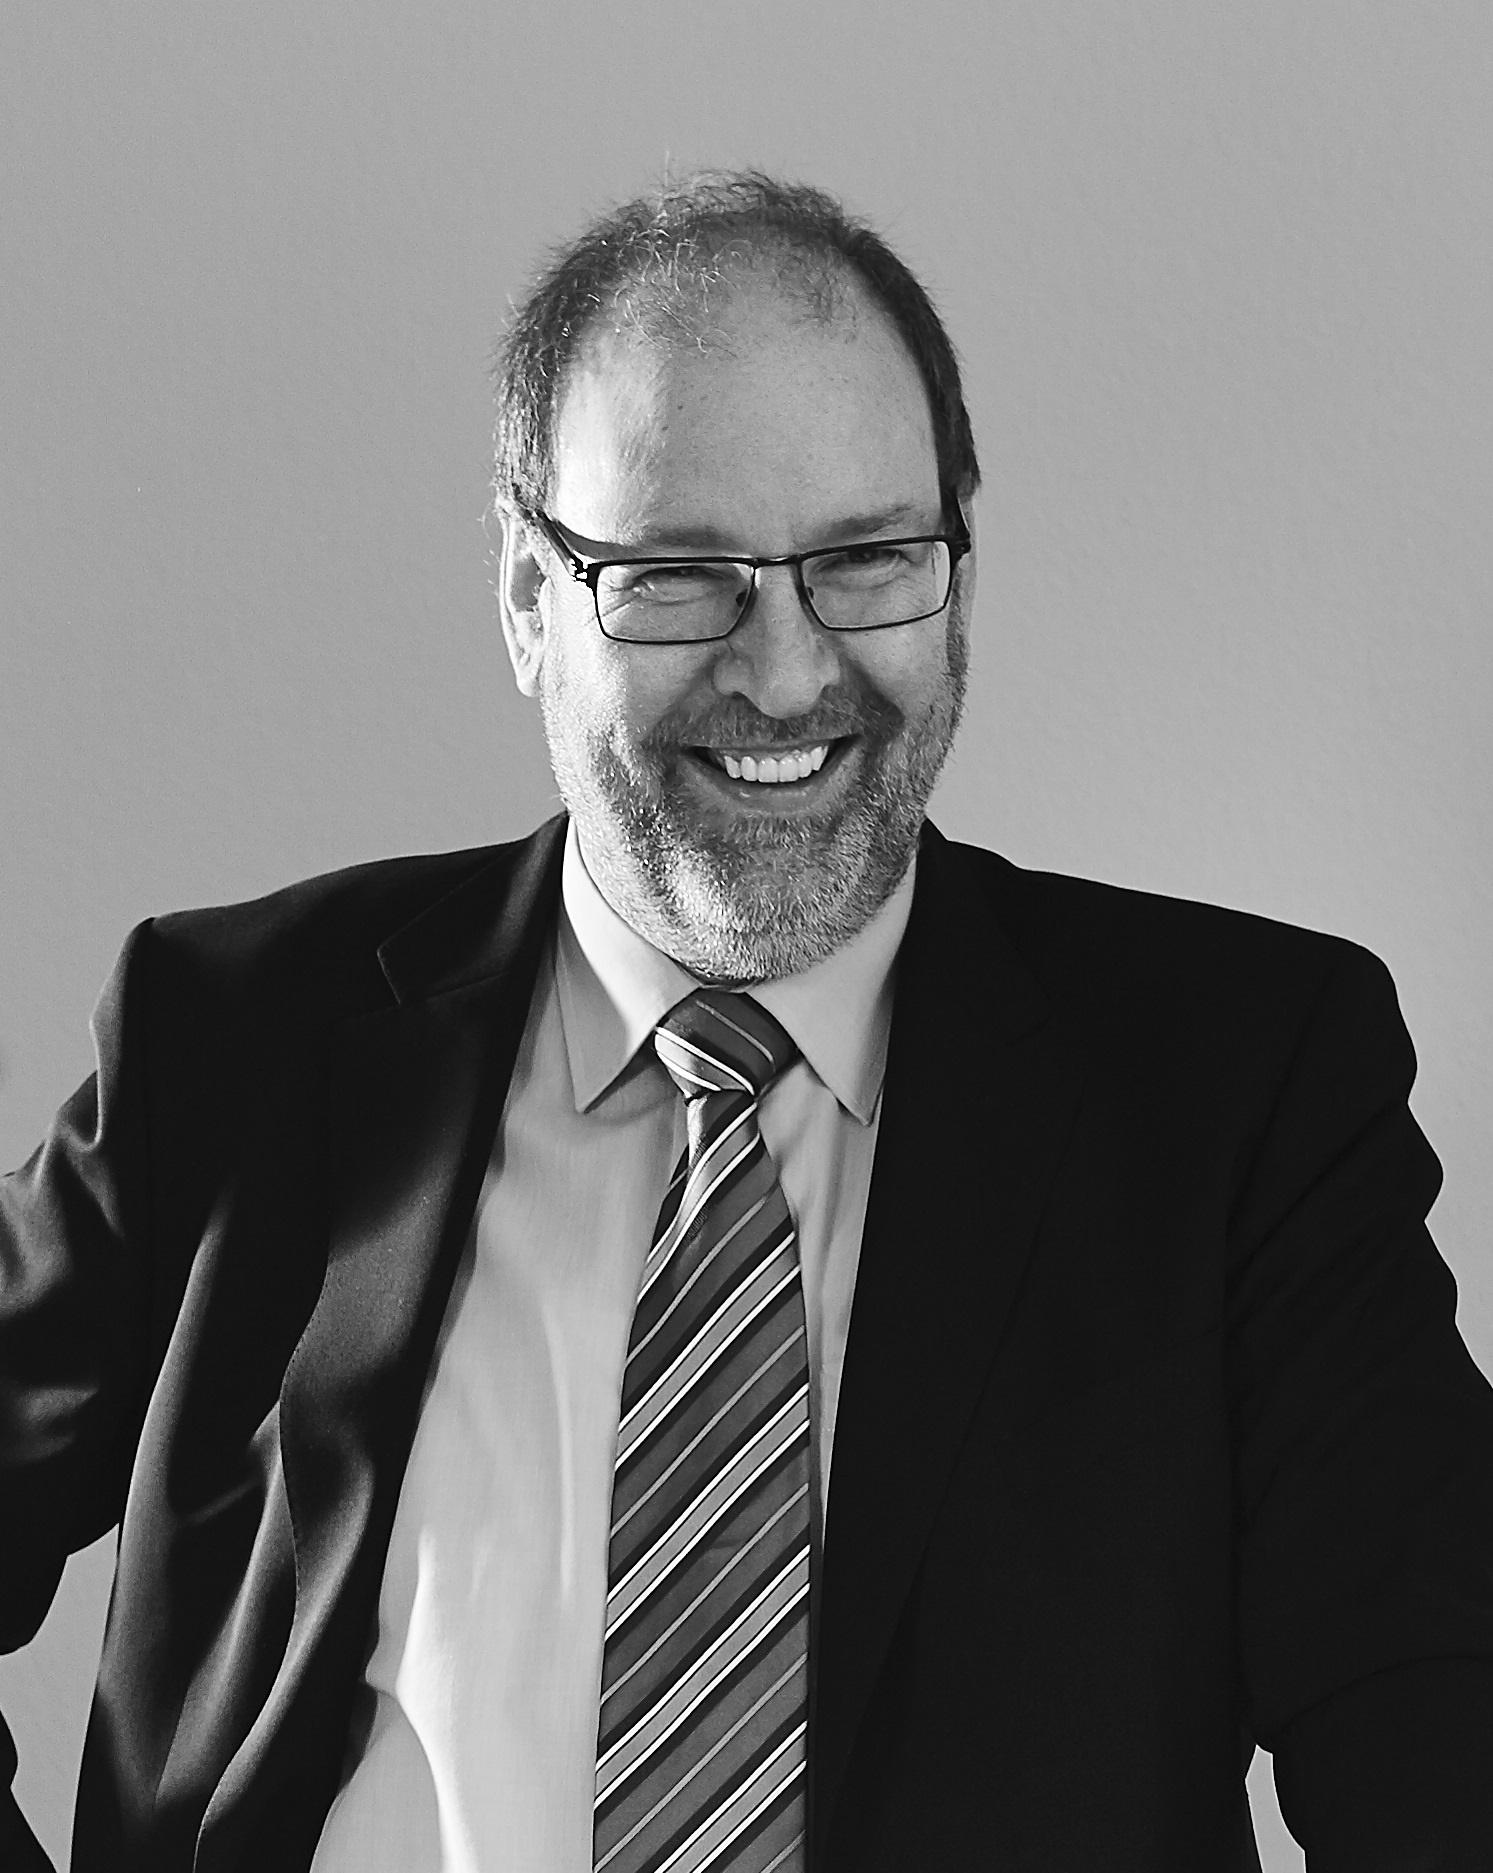 Rechtsanwalt Raimund Schafmeister